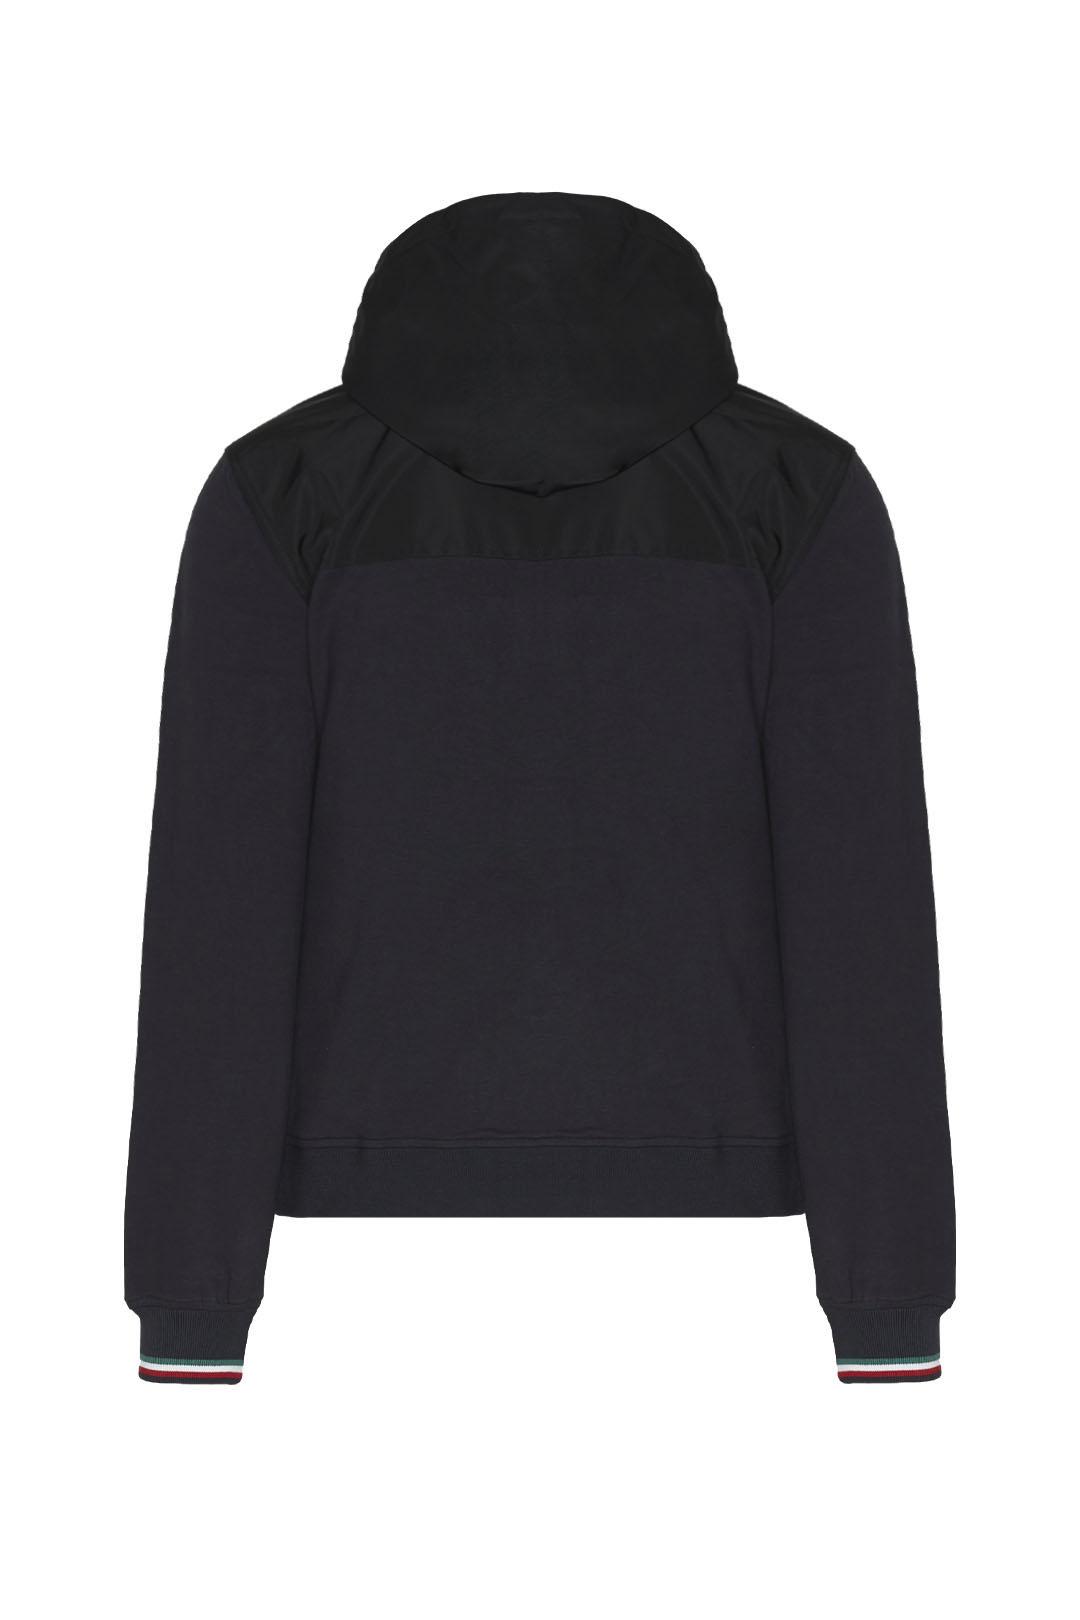 Jacke mit Kapuze aus Fleece und Nylon    2